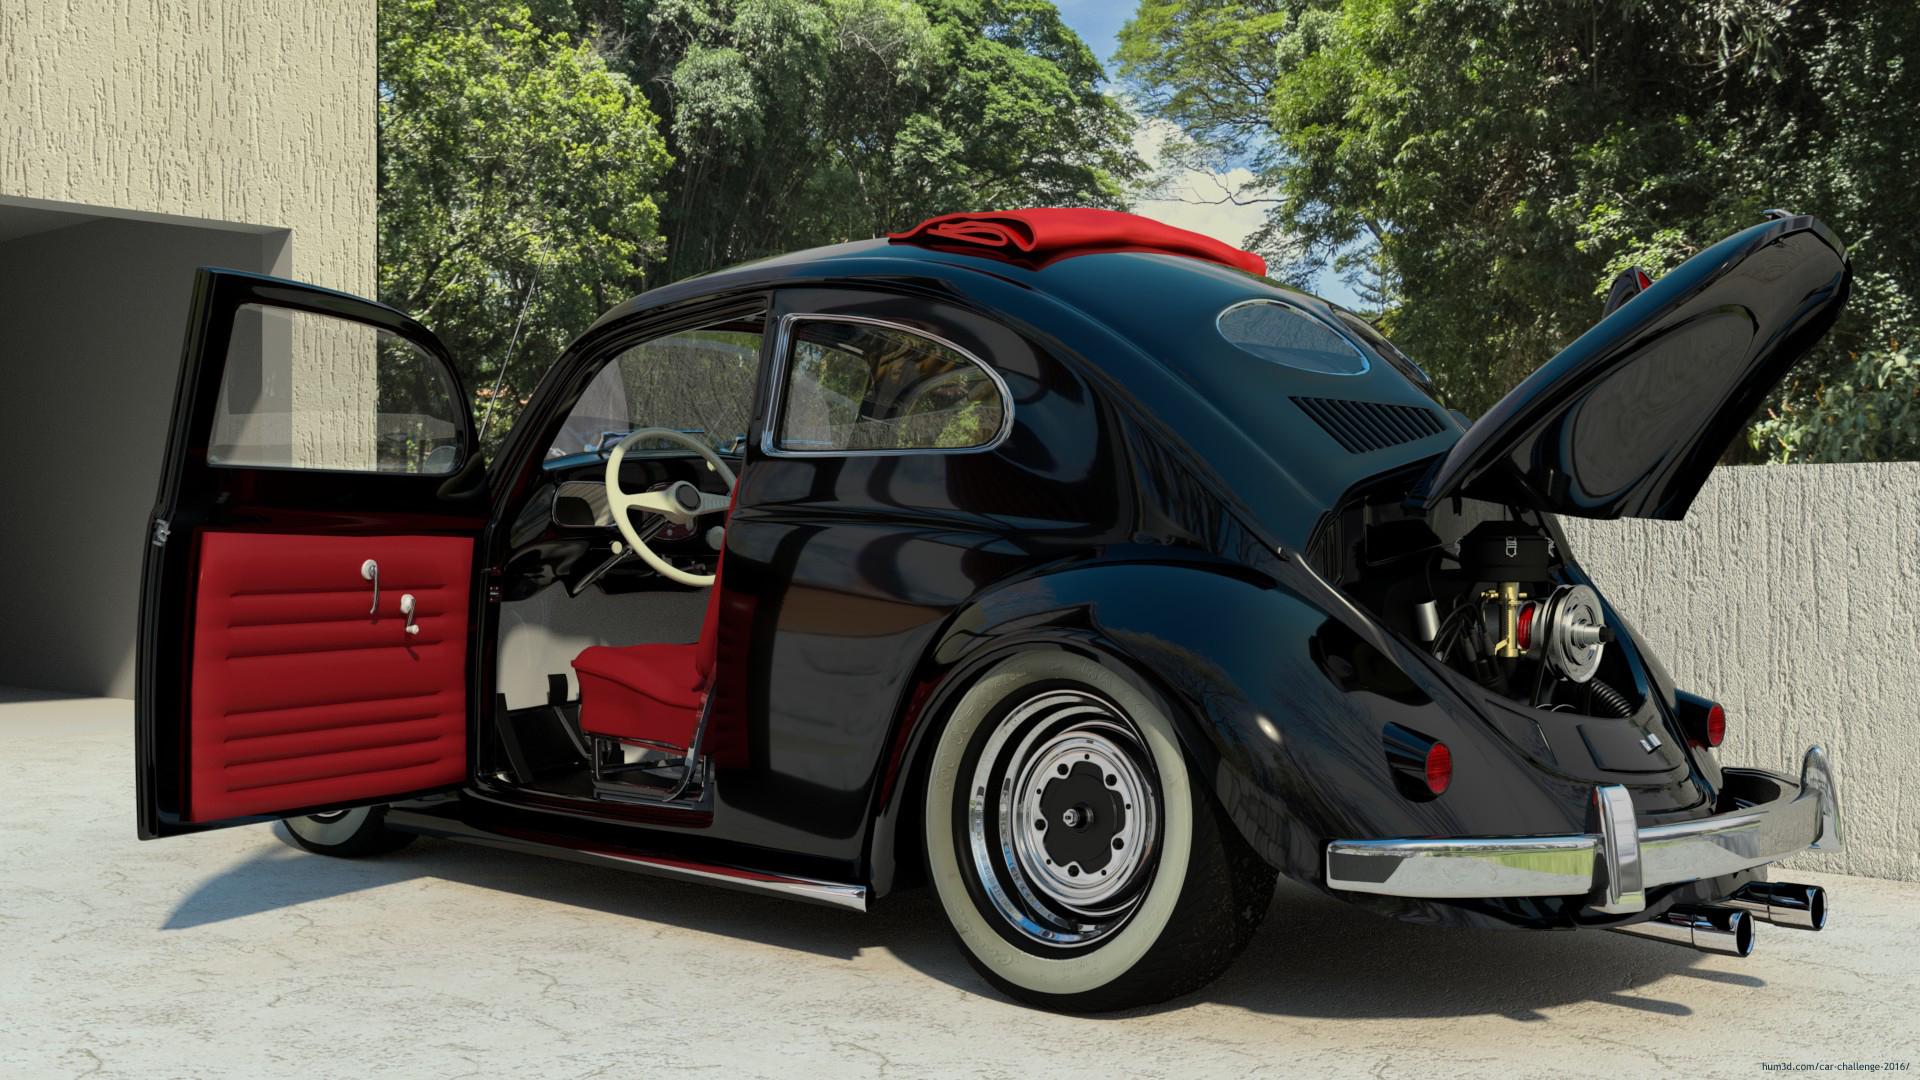 VW 52 Ragtop 3d art